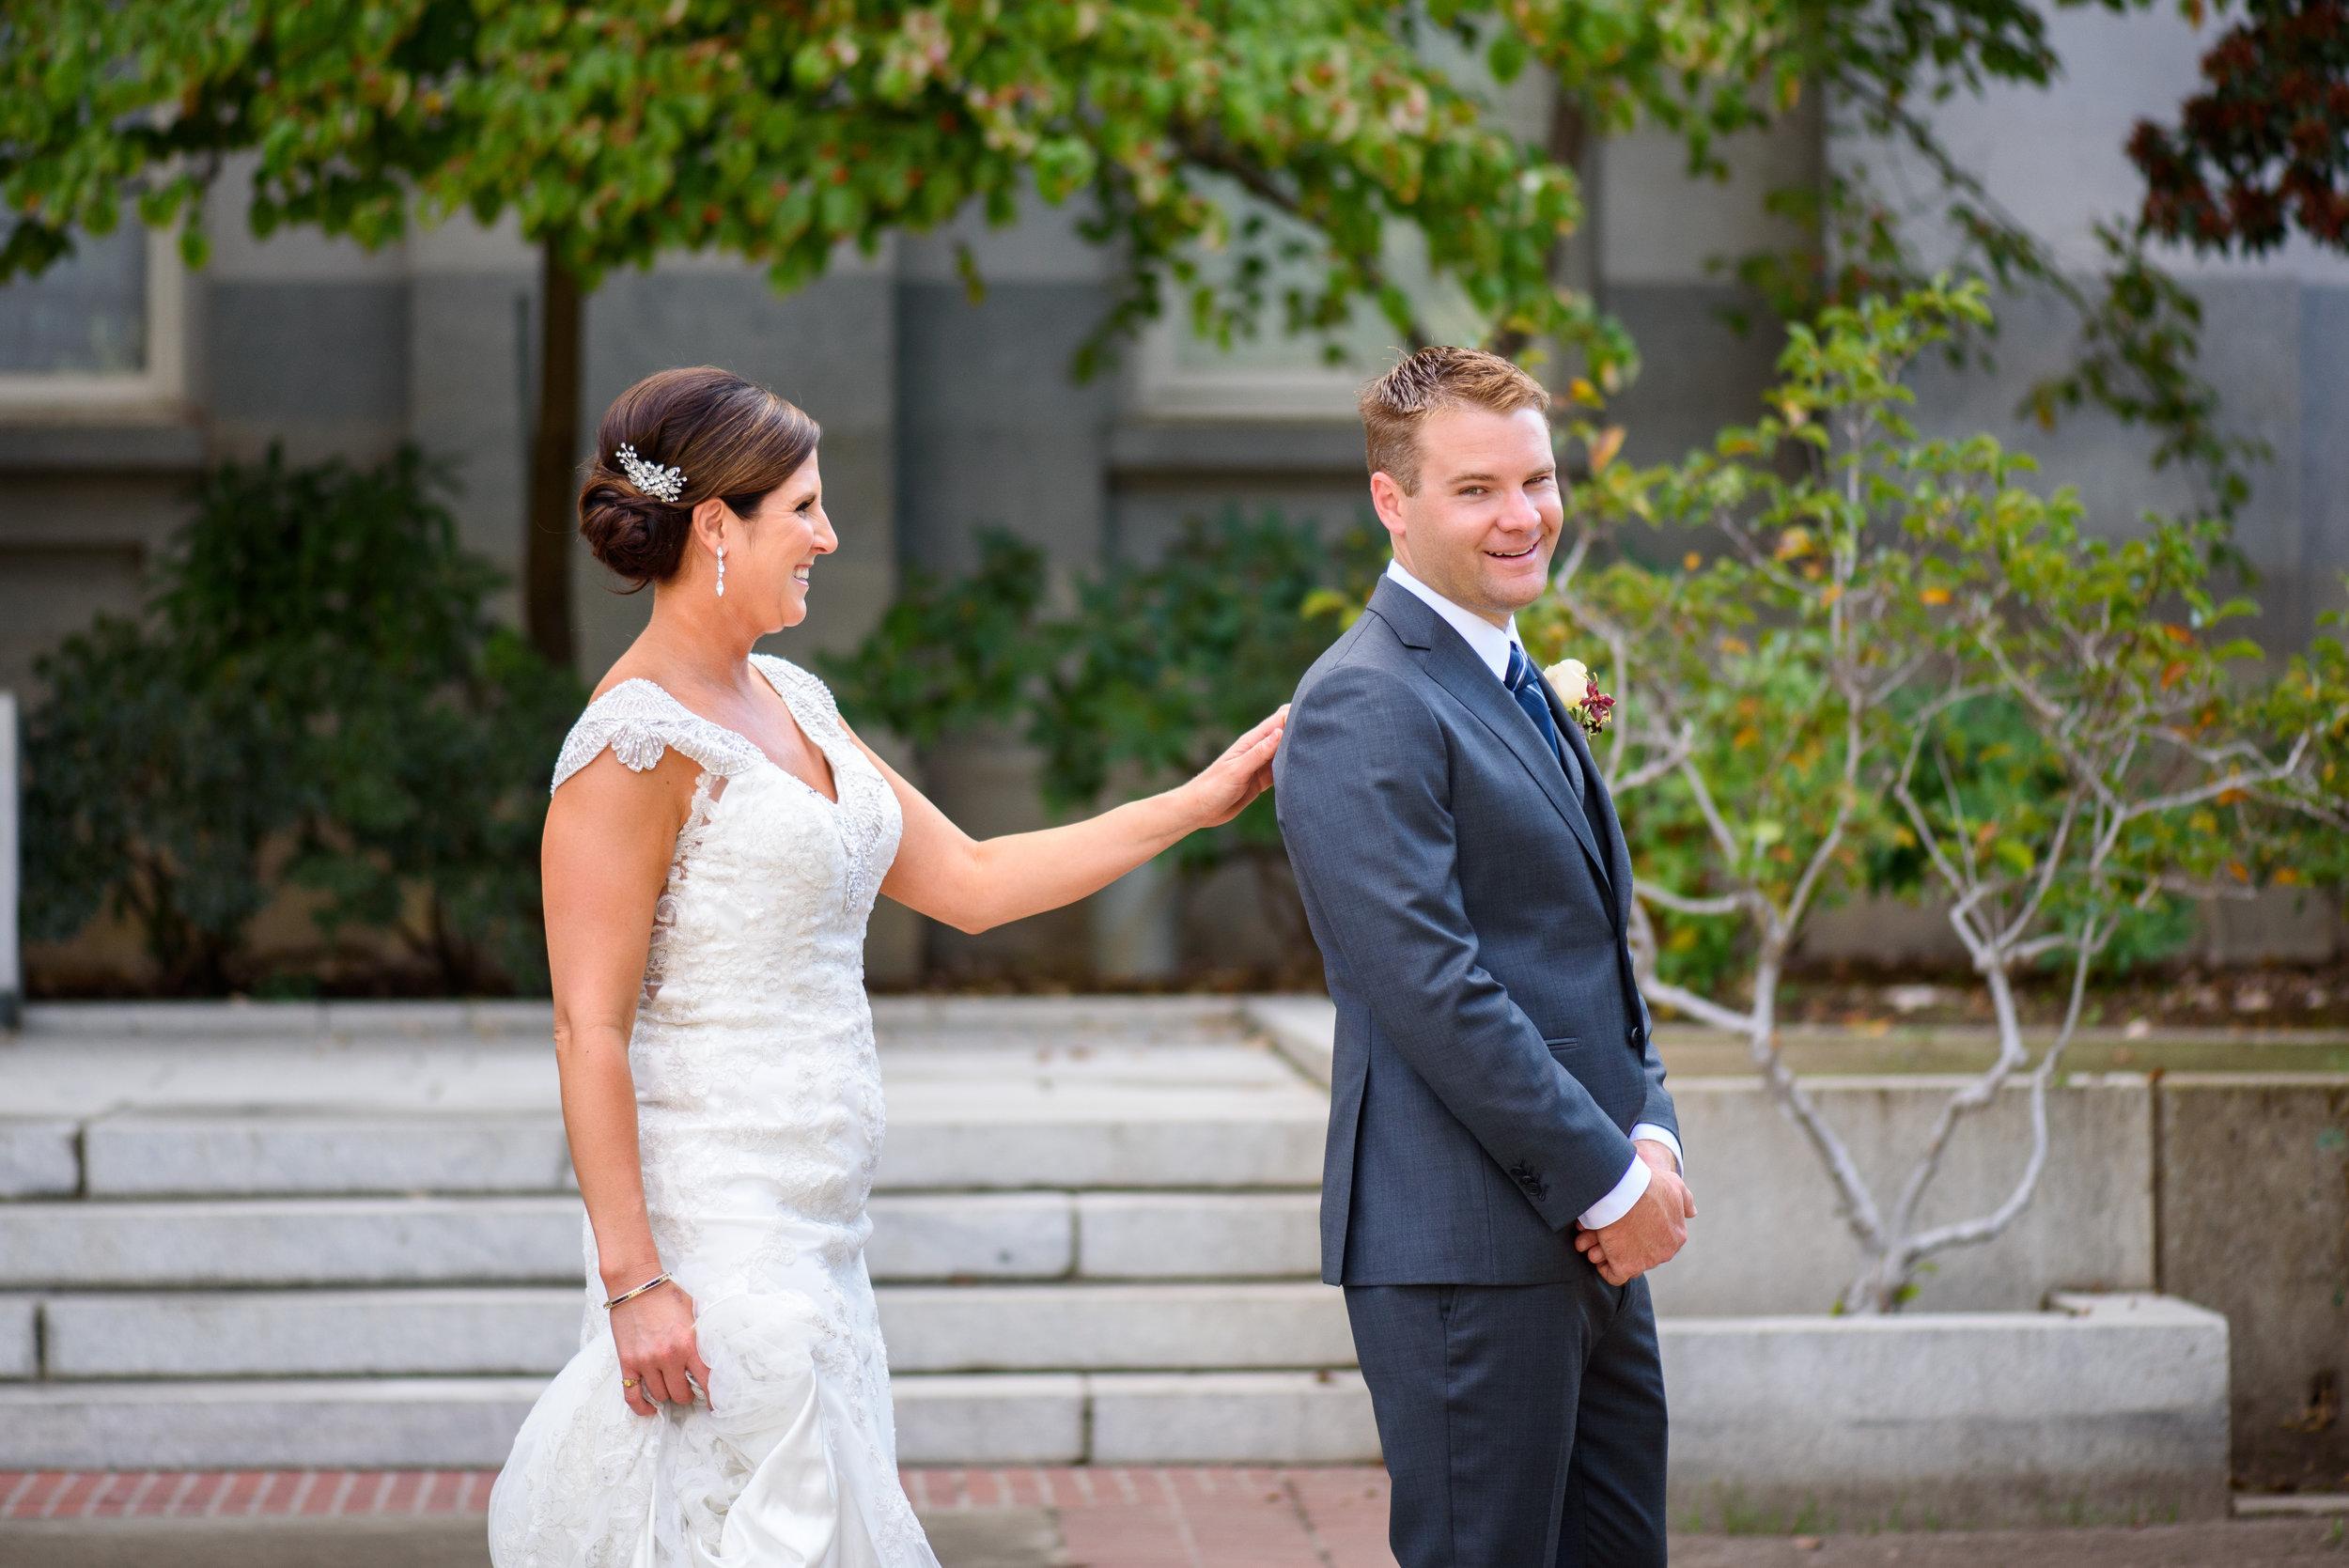 annie-brian-002-antiquite-midtown-sacramento-wedding-photographer-katherine-nicole-photography.JPG